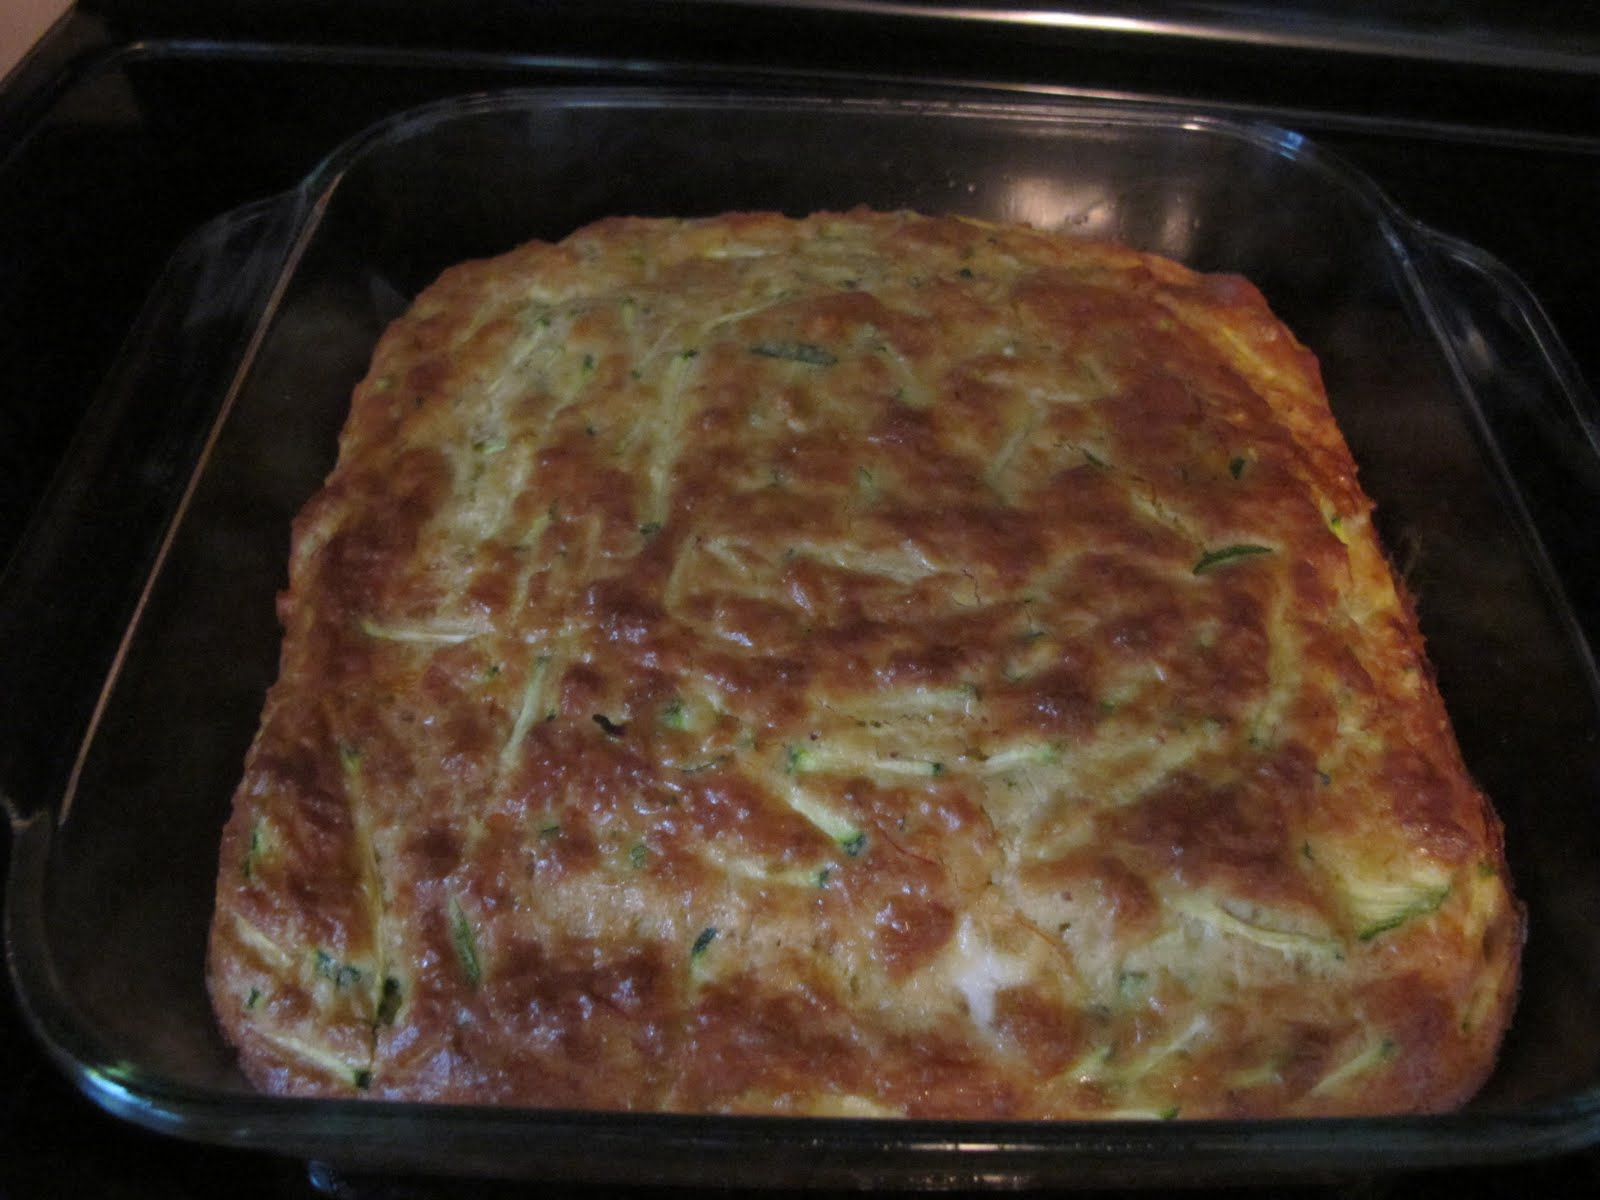 Enjoying Healthy Foods: Zucchini Breakfast Egg Casserole